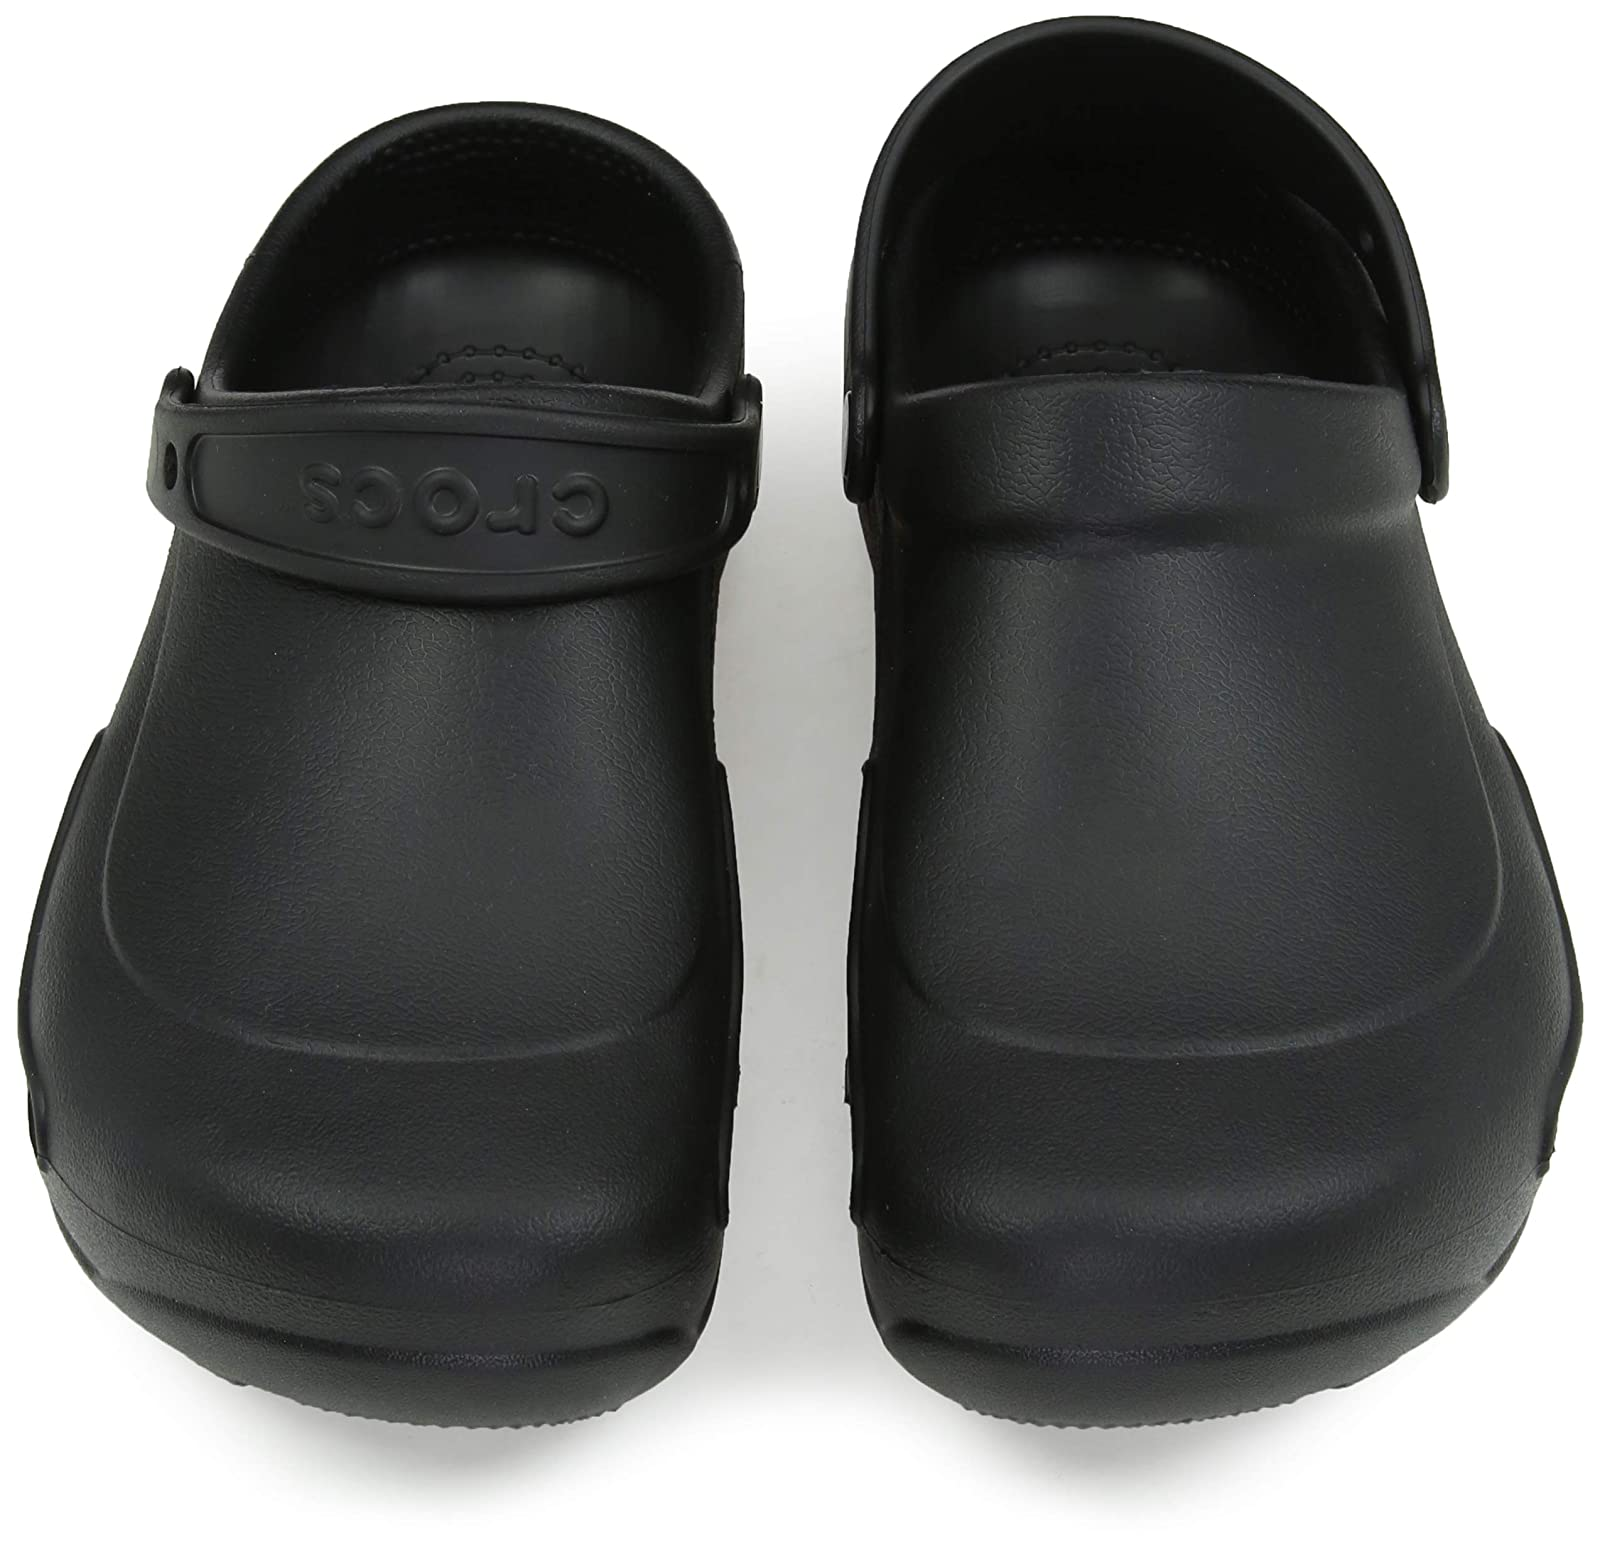 Crocs Unisex Specialist Vent Clog Black 11 10074M Black - 8